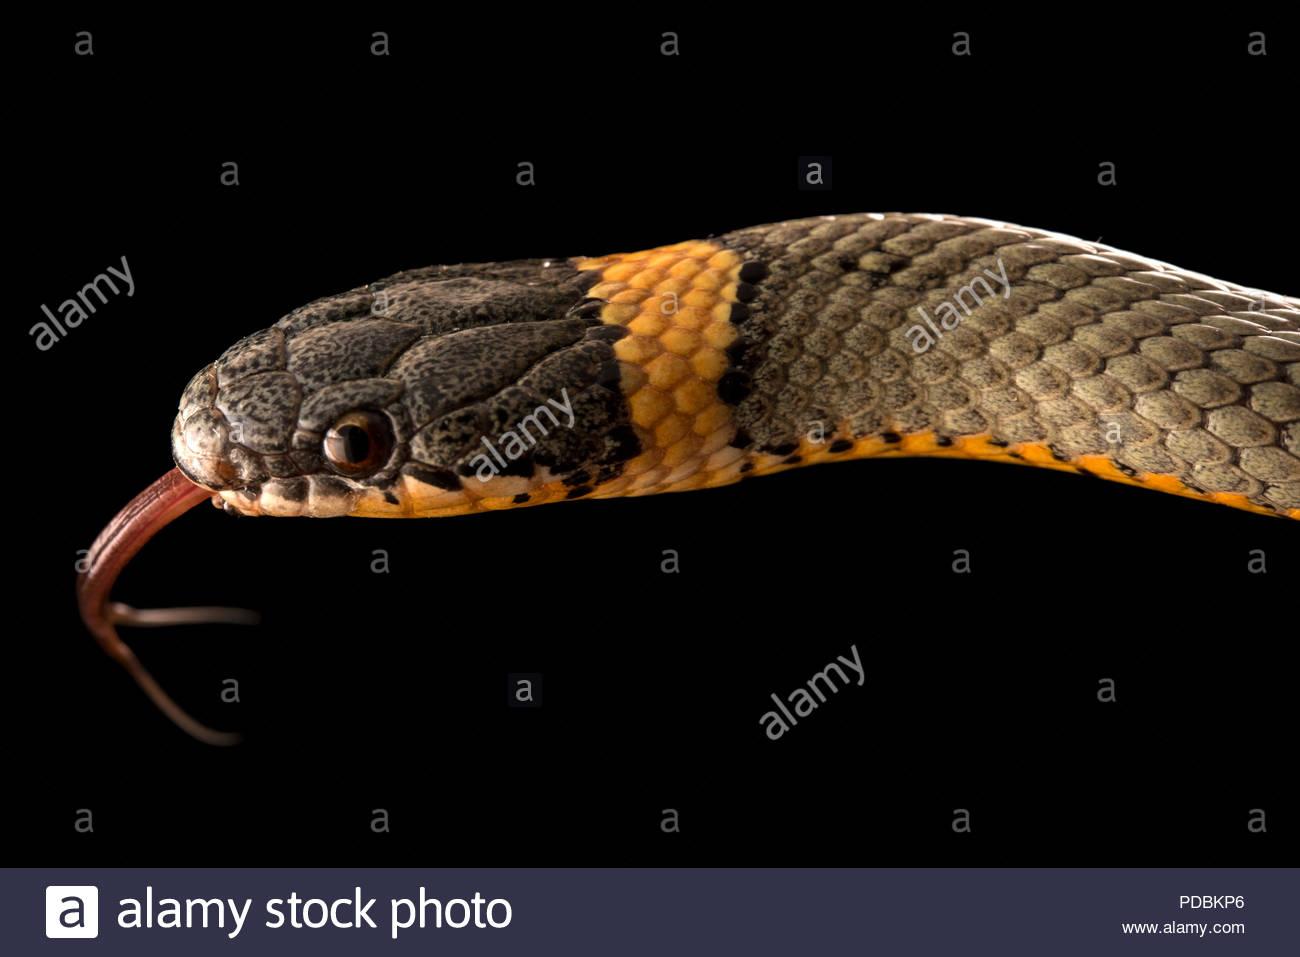 Regal ringneck snake, Diadophis punctatus regalis, at the Arizona Sonora Desert Museum. - Stock Image